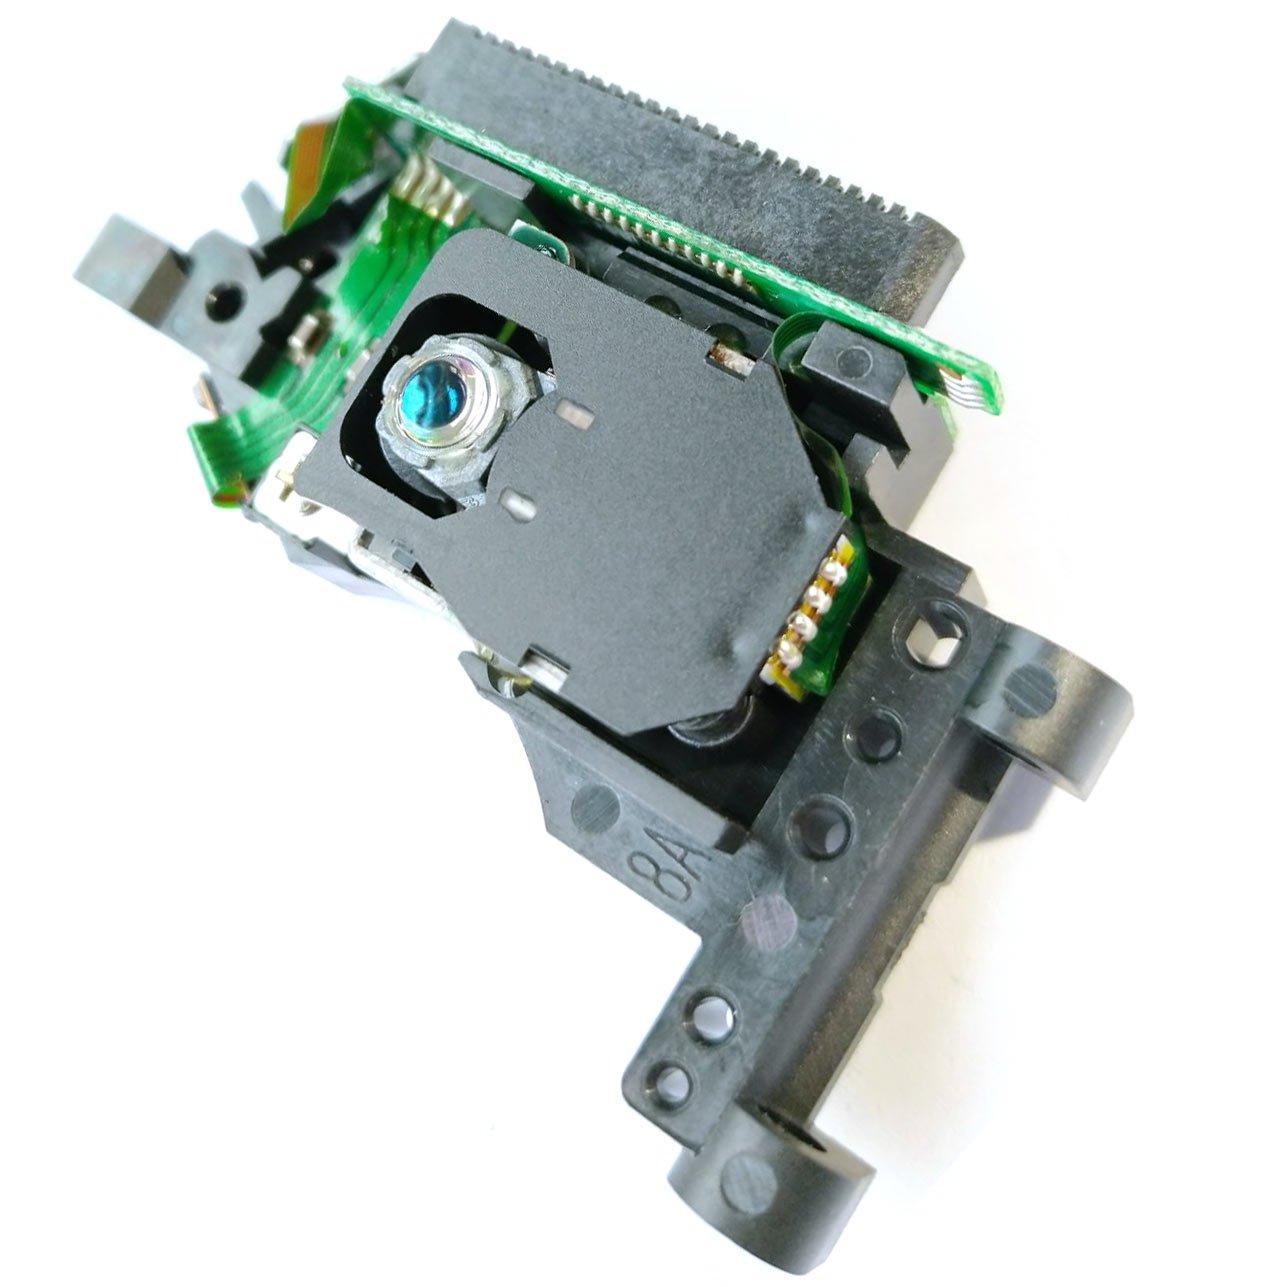 Original SACD Optical Pickup for CH D1 SACD Laser Lens by Allpartz